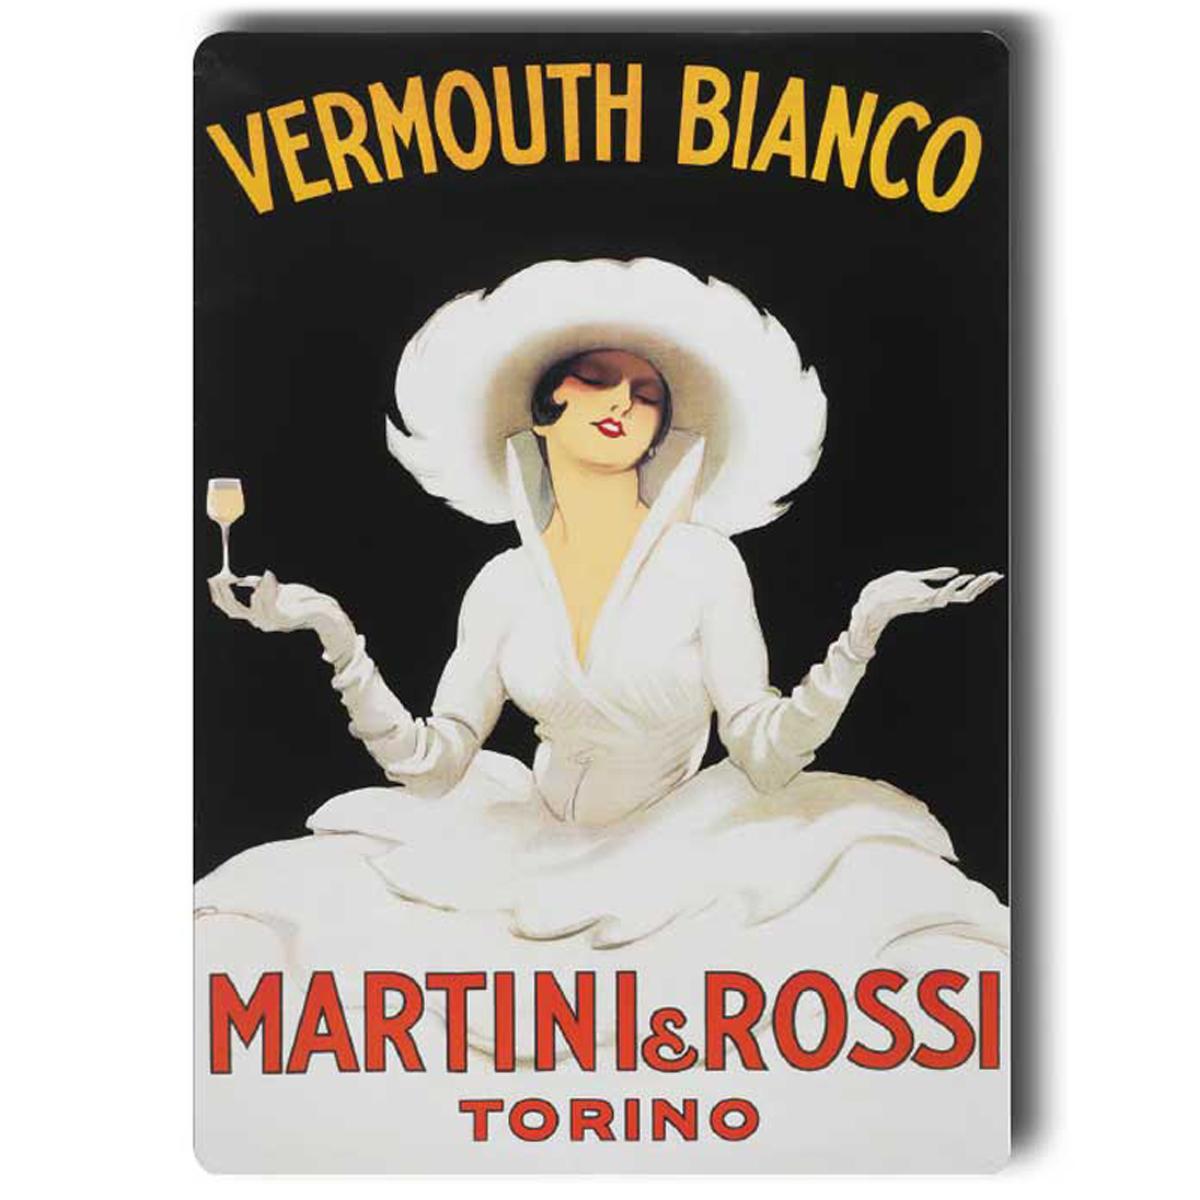 Magnet métal rétro \'Vermouth Bianco Martini Rossi\' - 9x65 cm - [A0632]